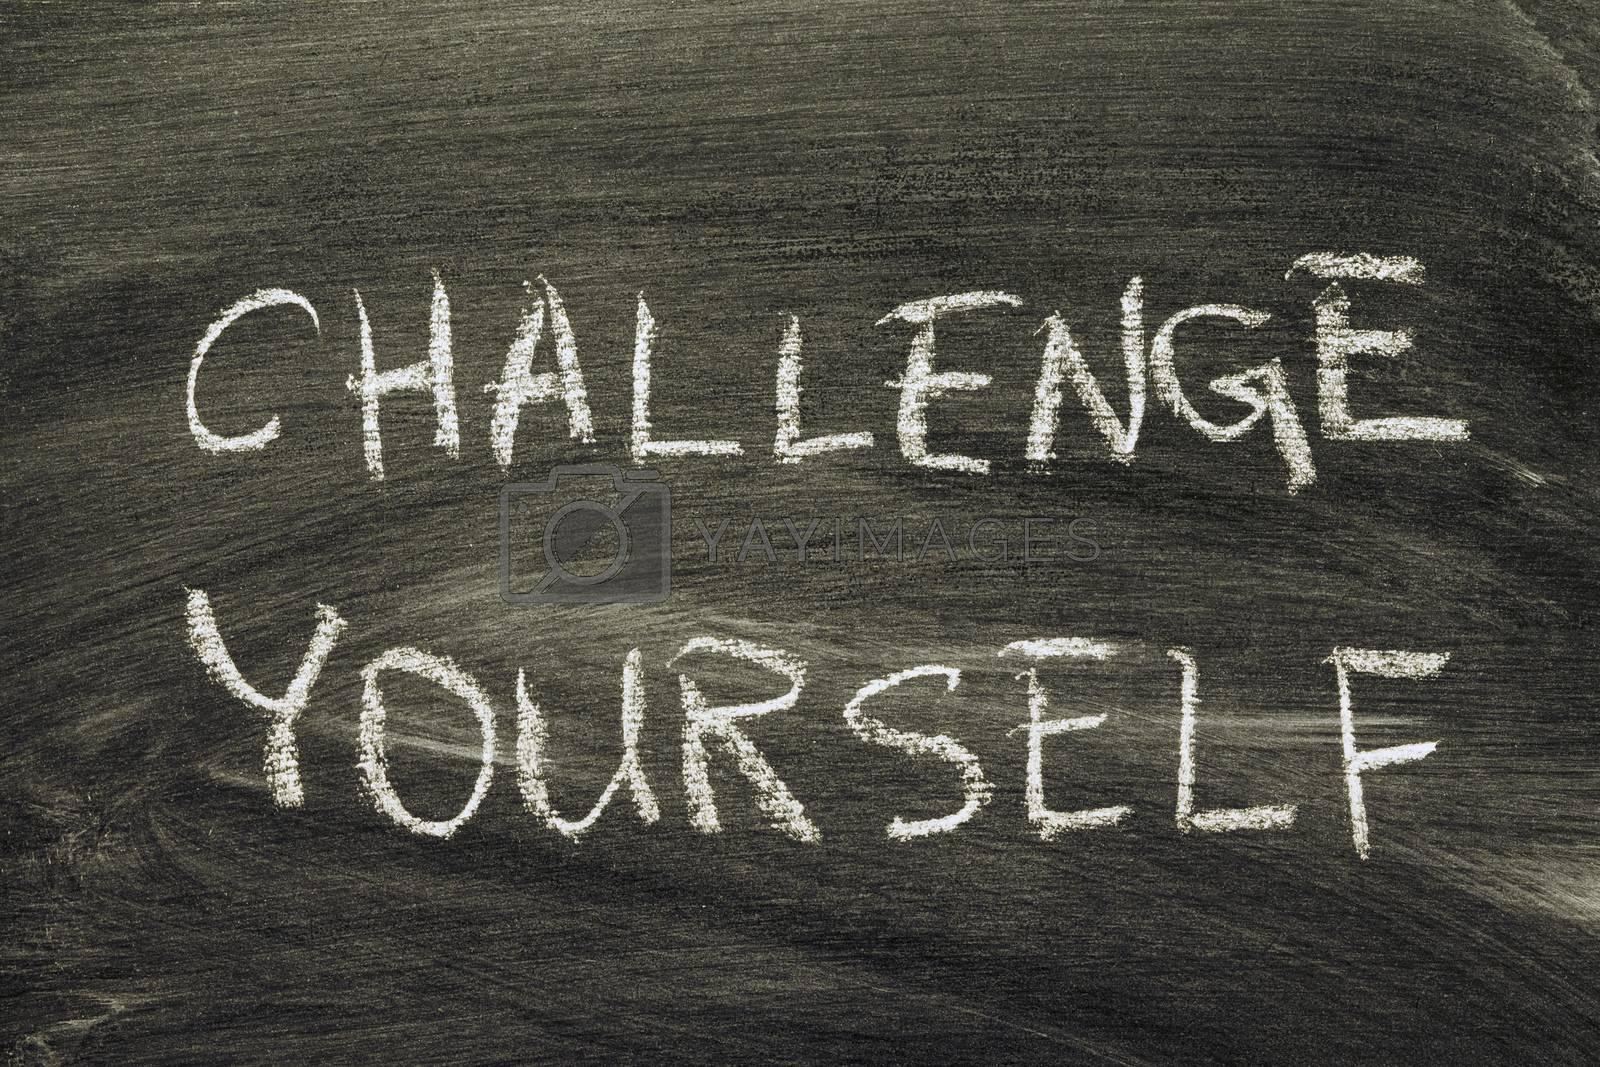 challenge yourself phrase handwritten on school blackboard